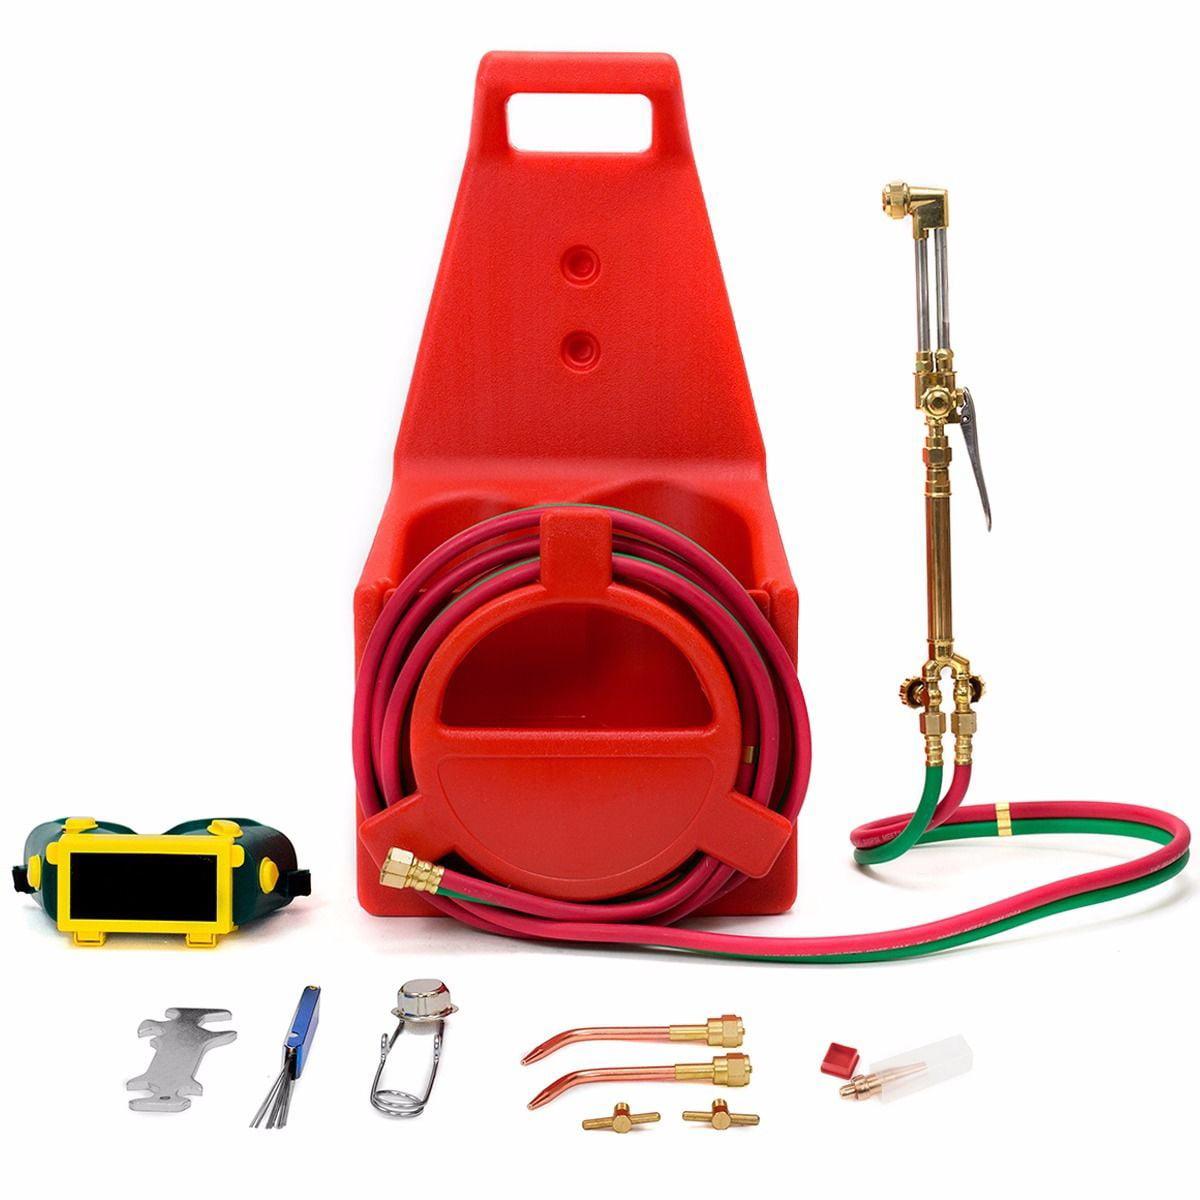 GHP Portable Victor Oxygen Acetylene Welding Cutting Torc...